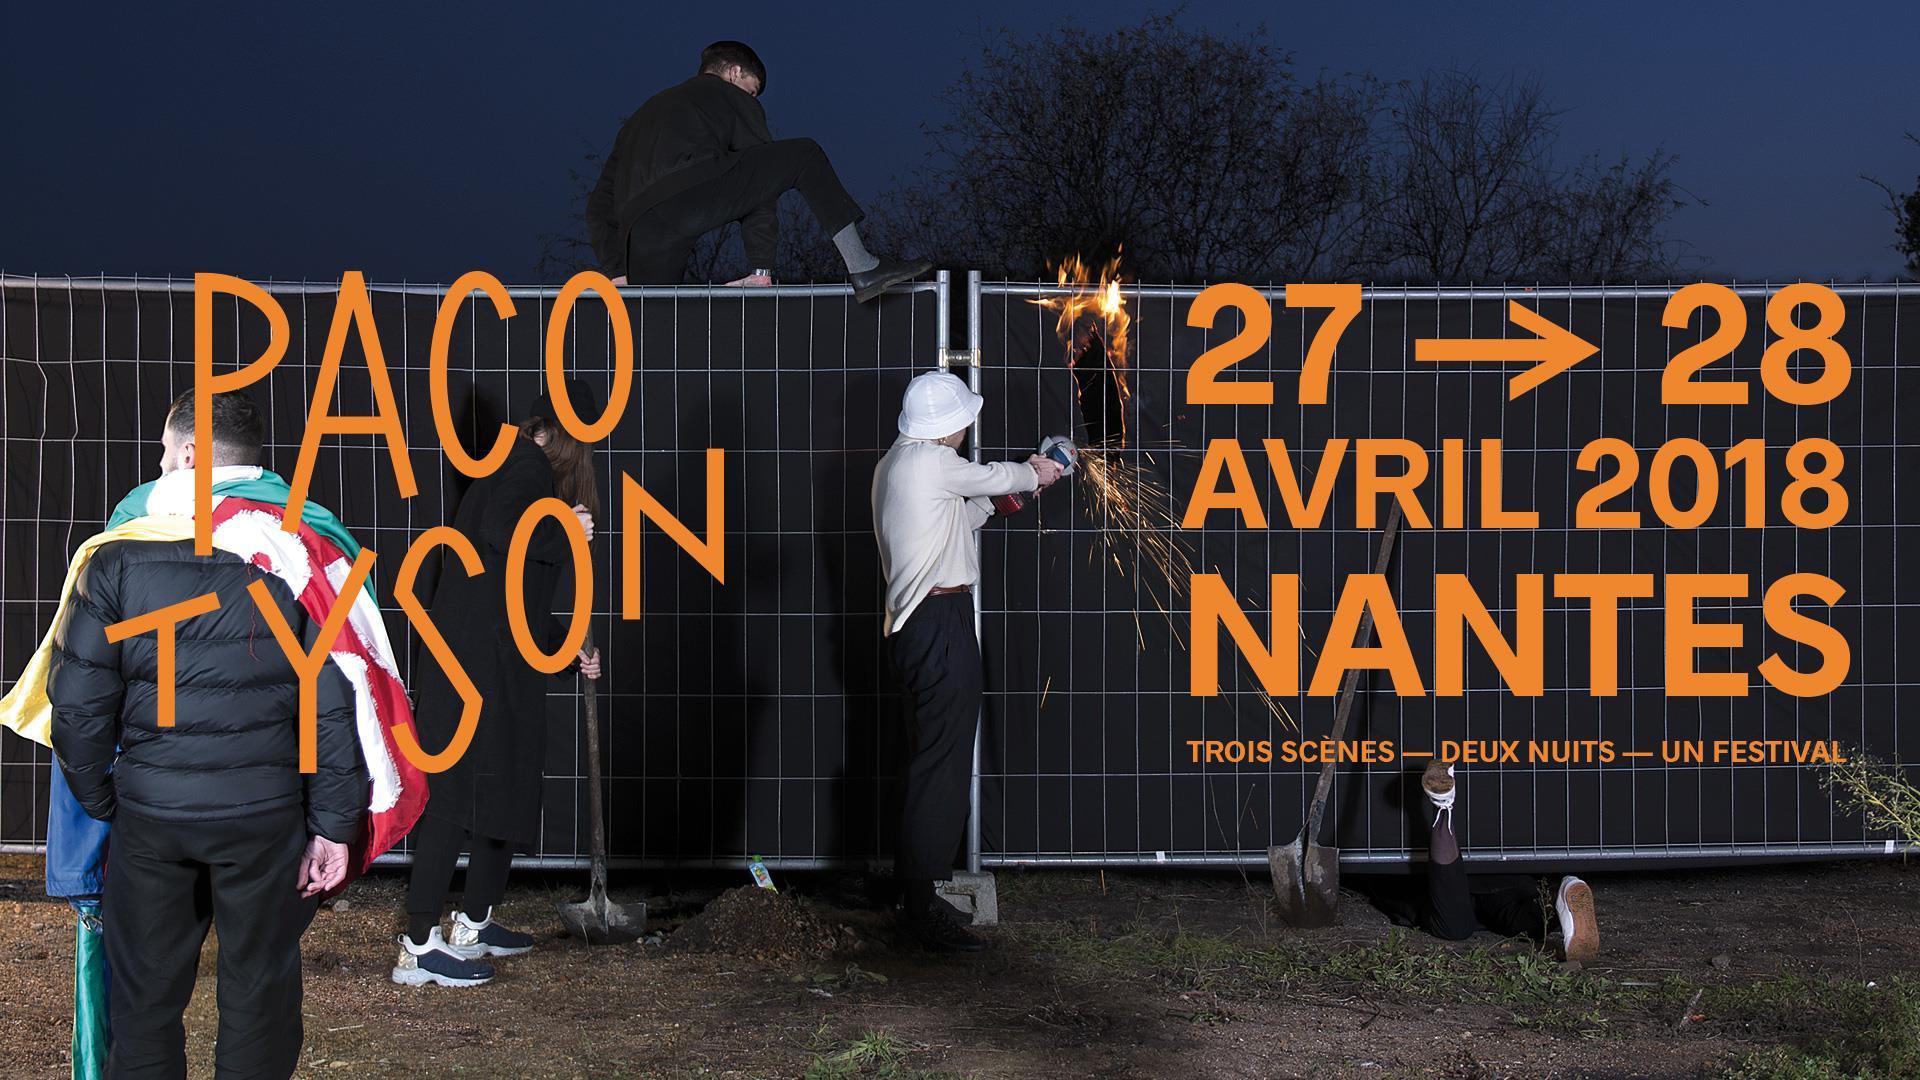 festival nantes 28 avril